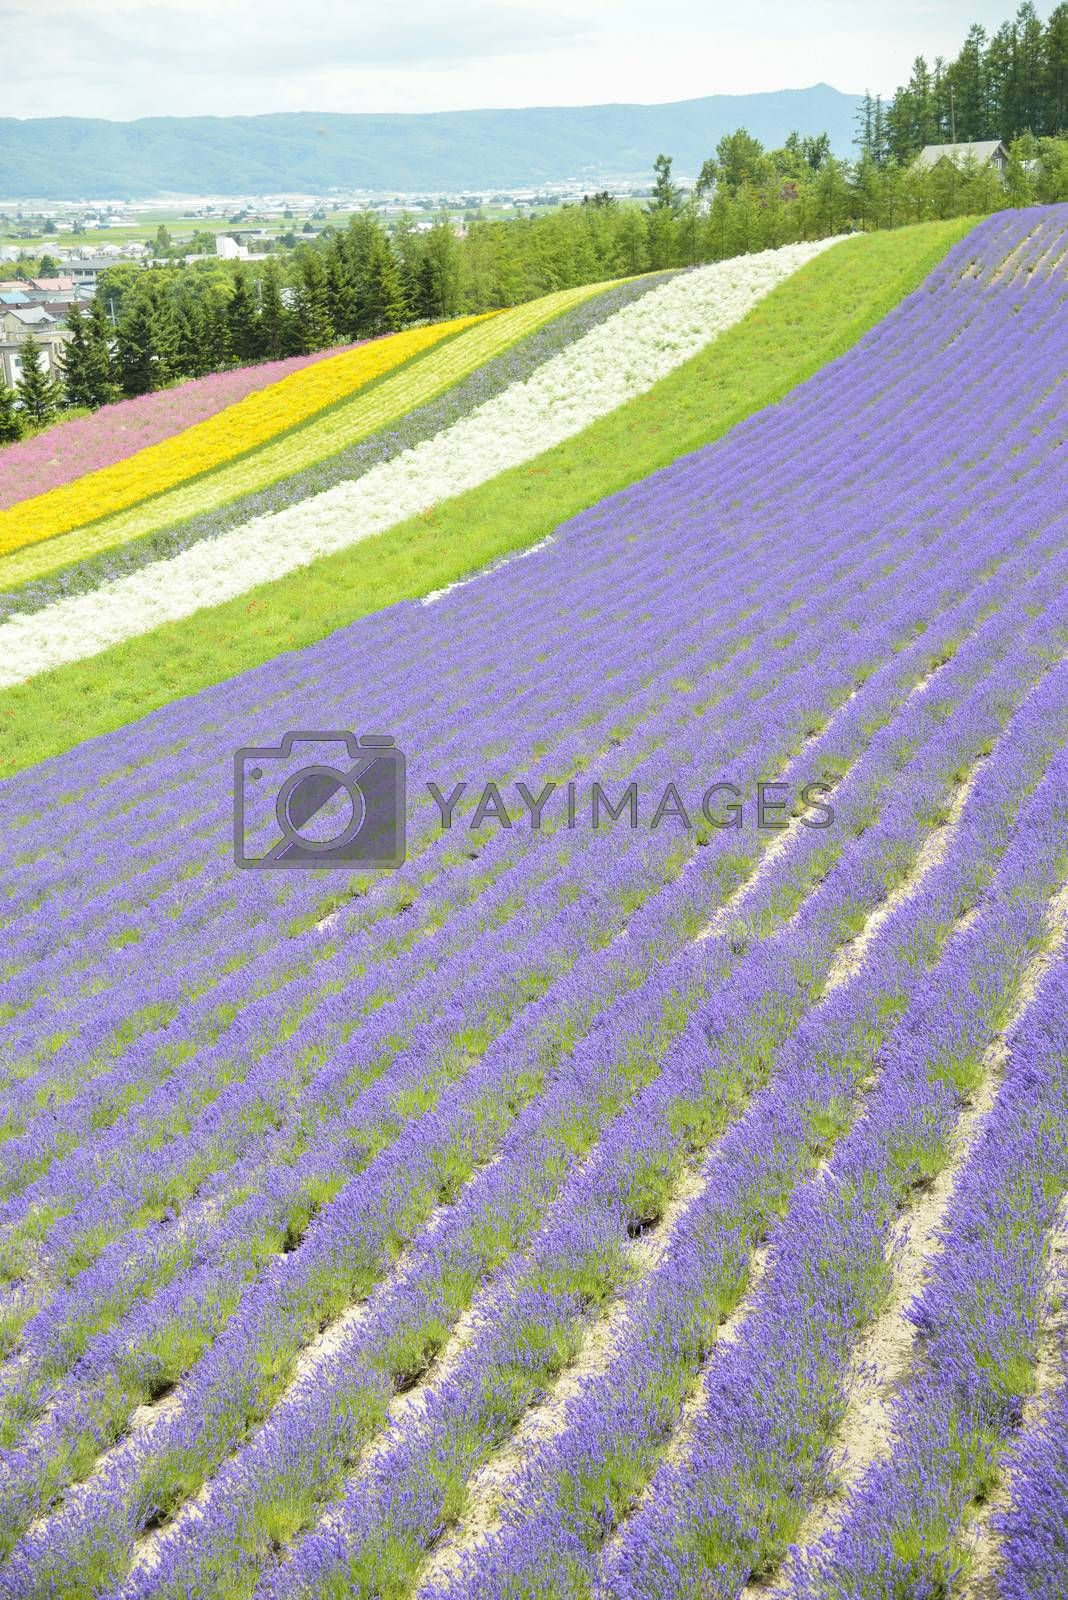 Colorful Lavender farm10